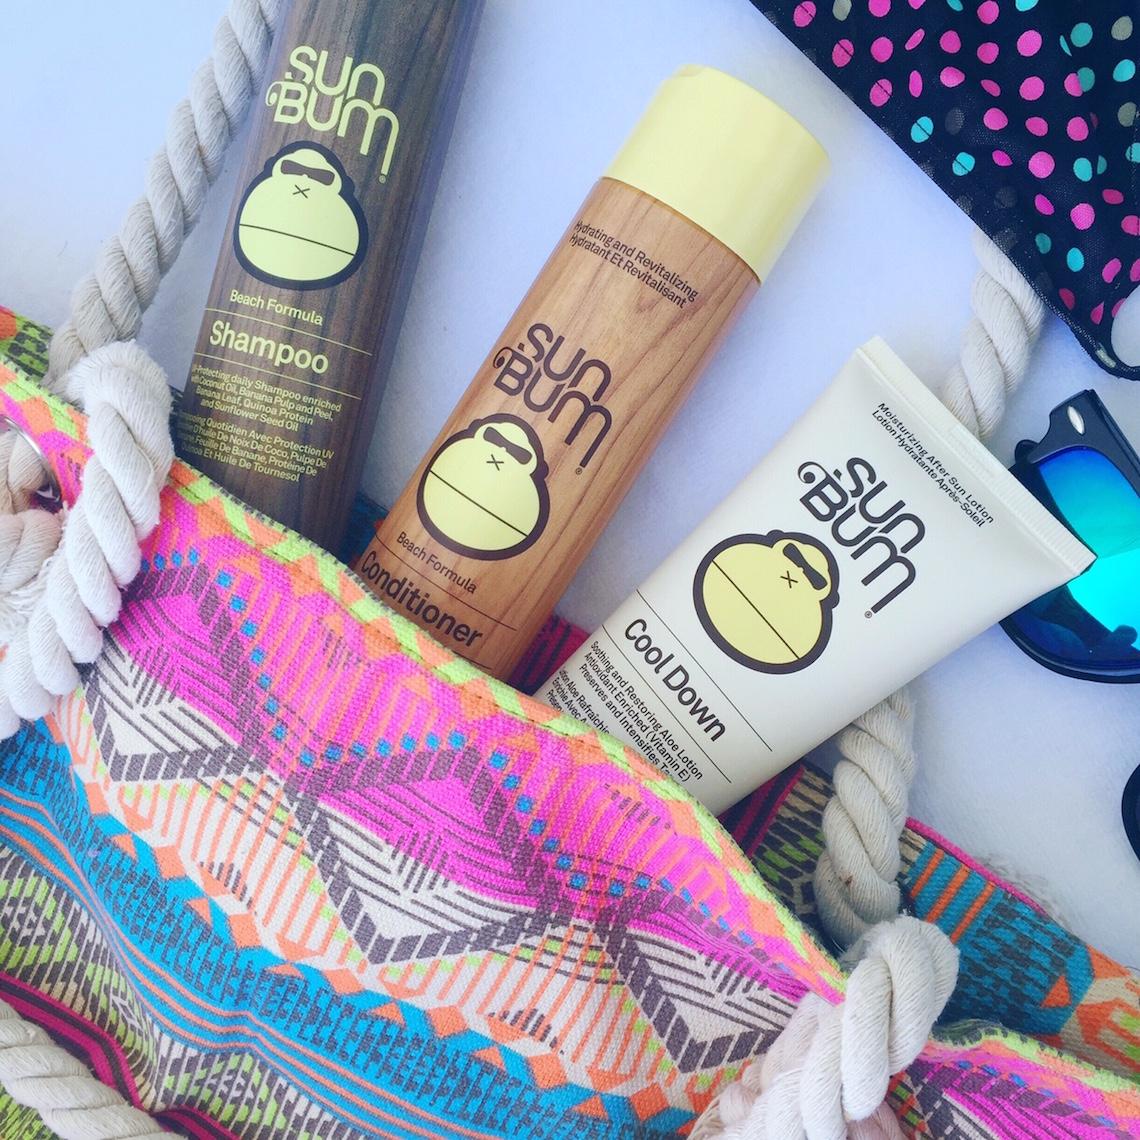 sun bum hair care line